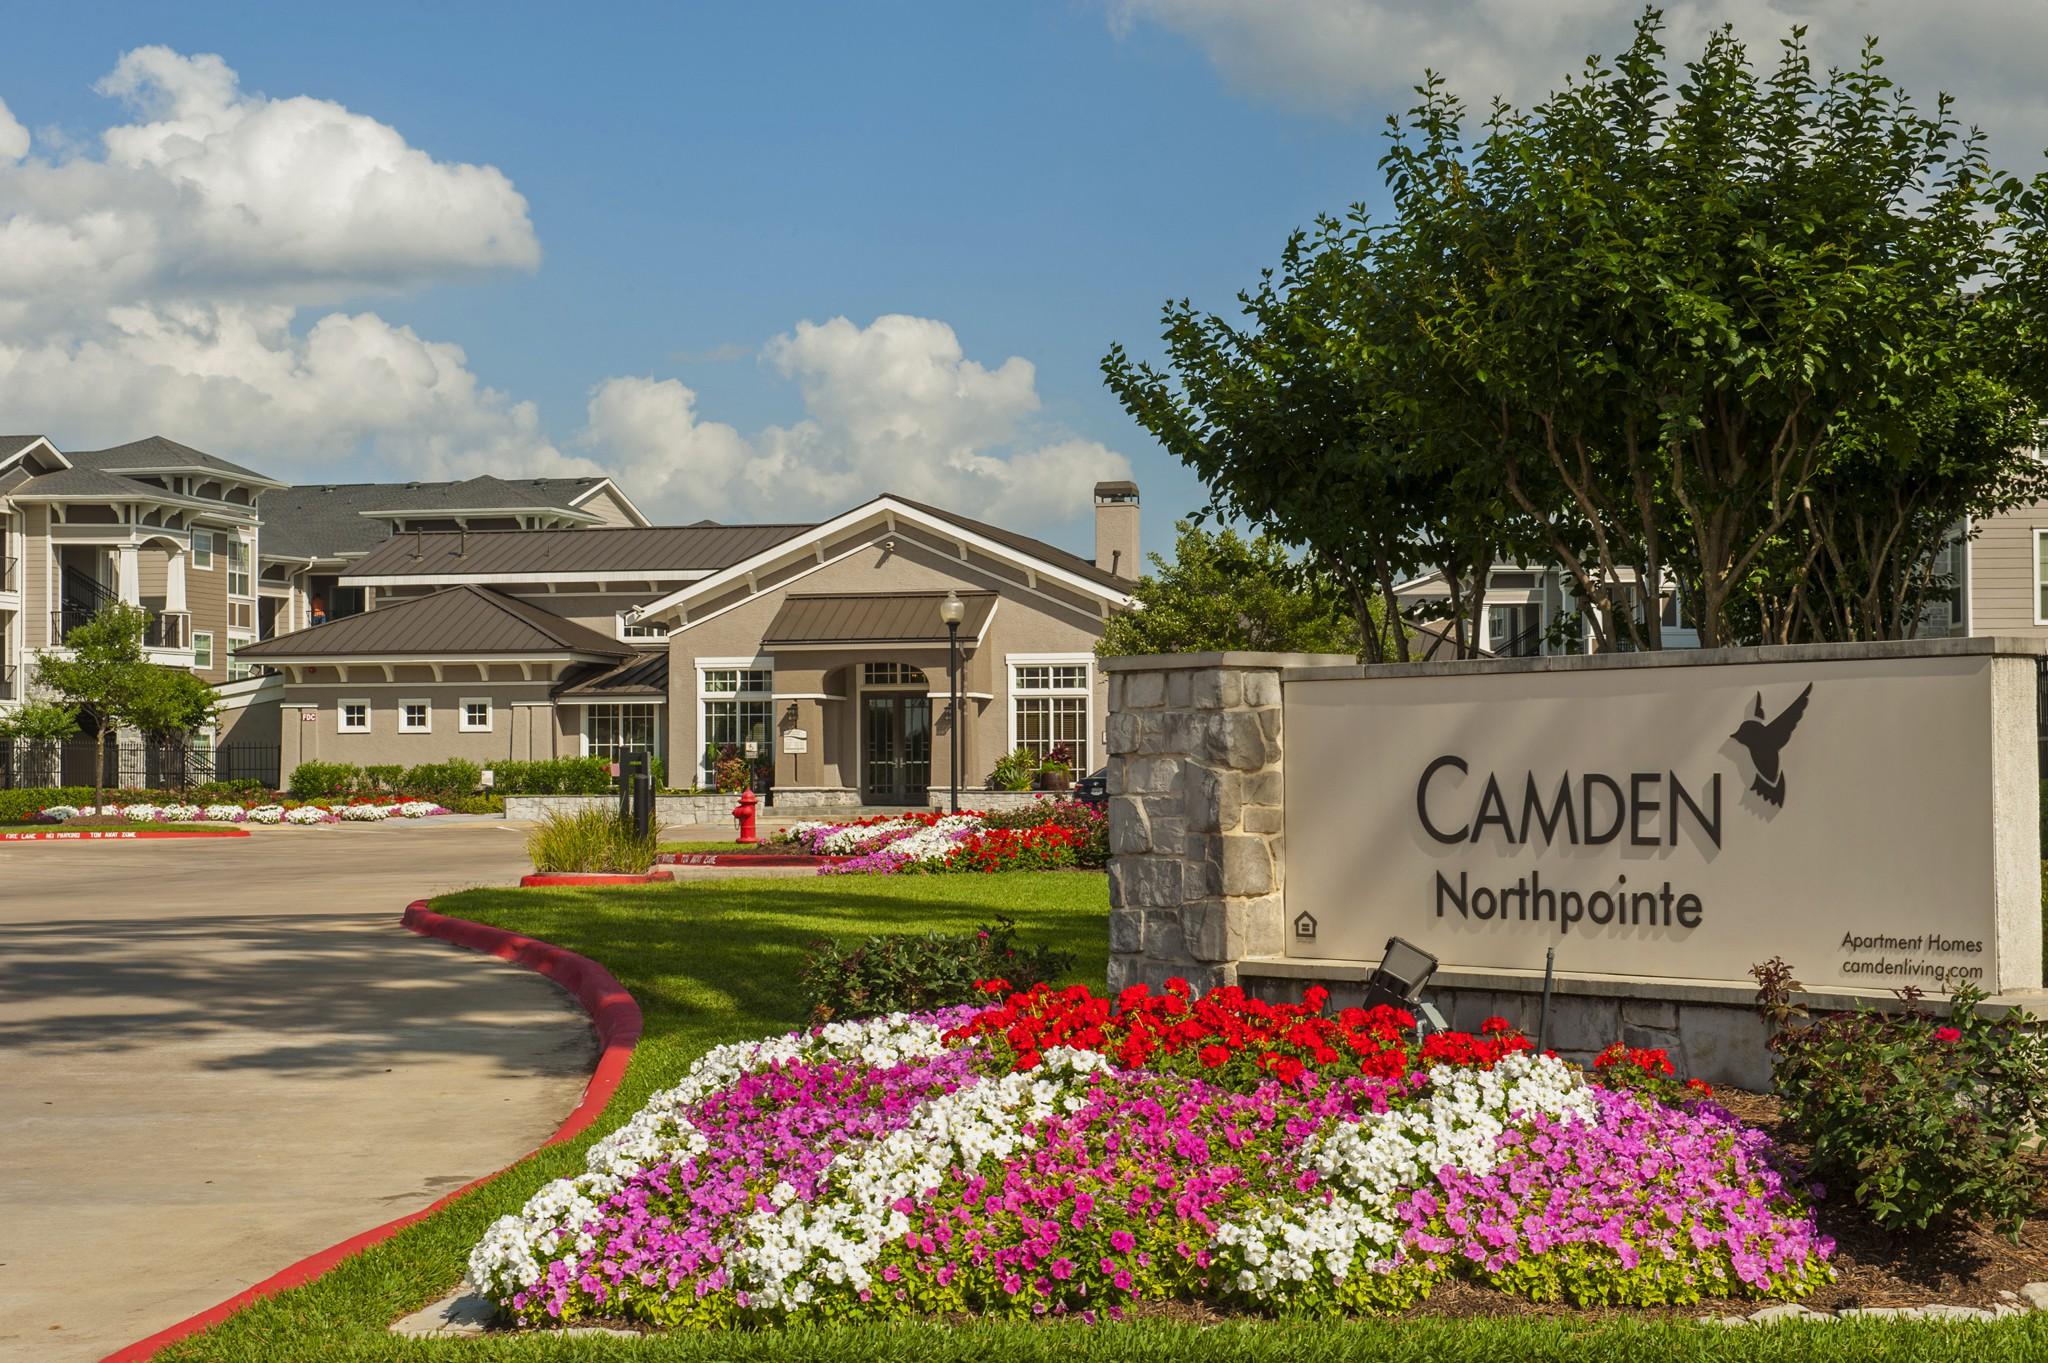 Camden Northpointe